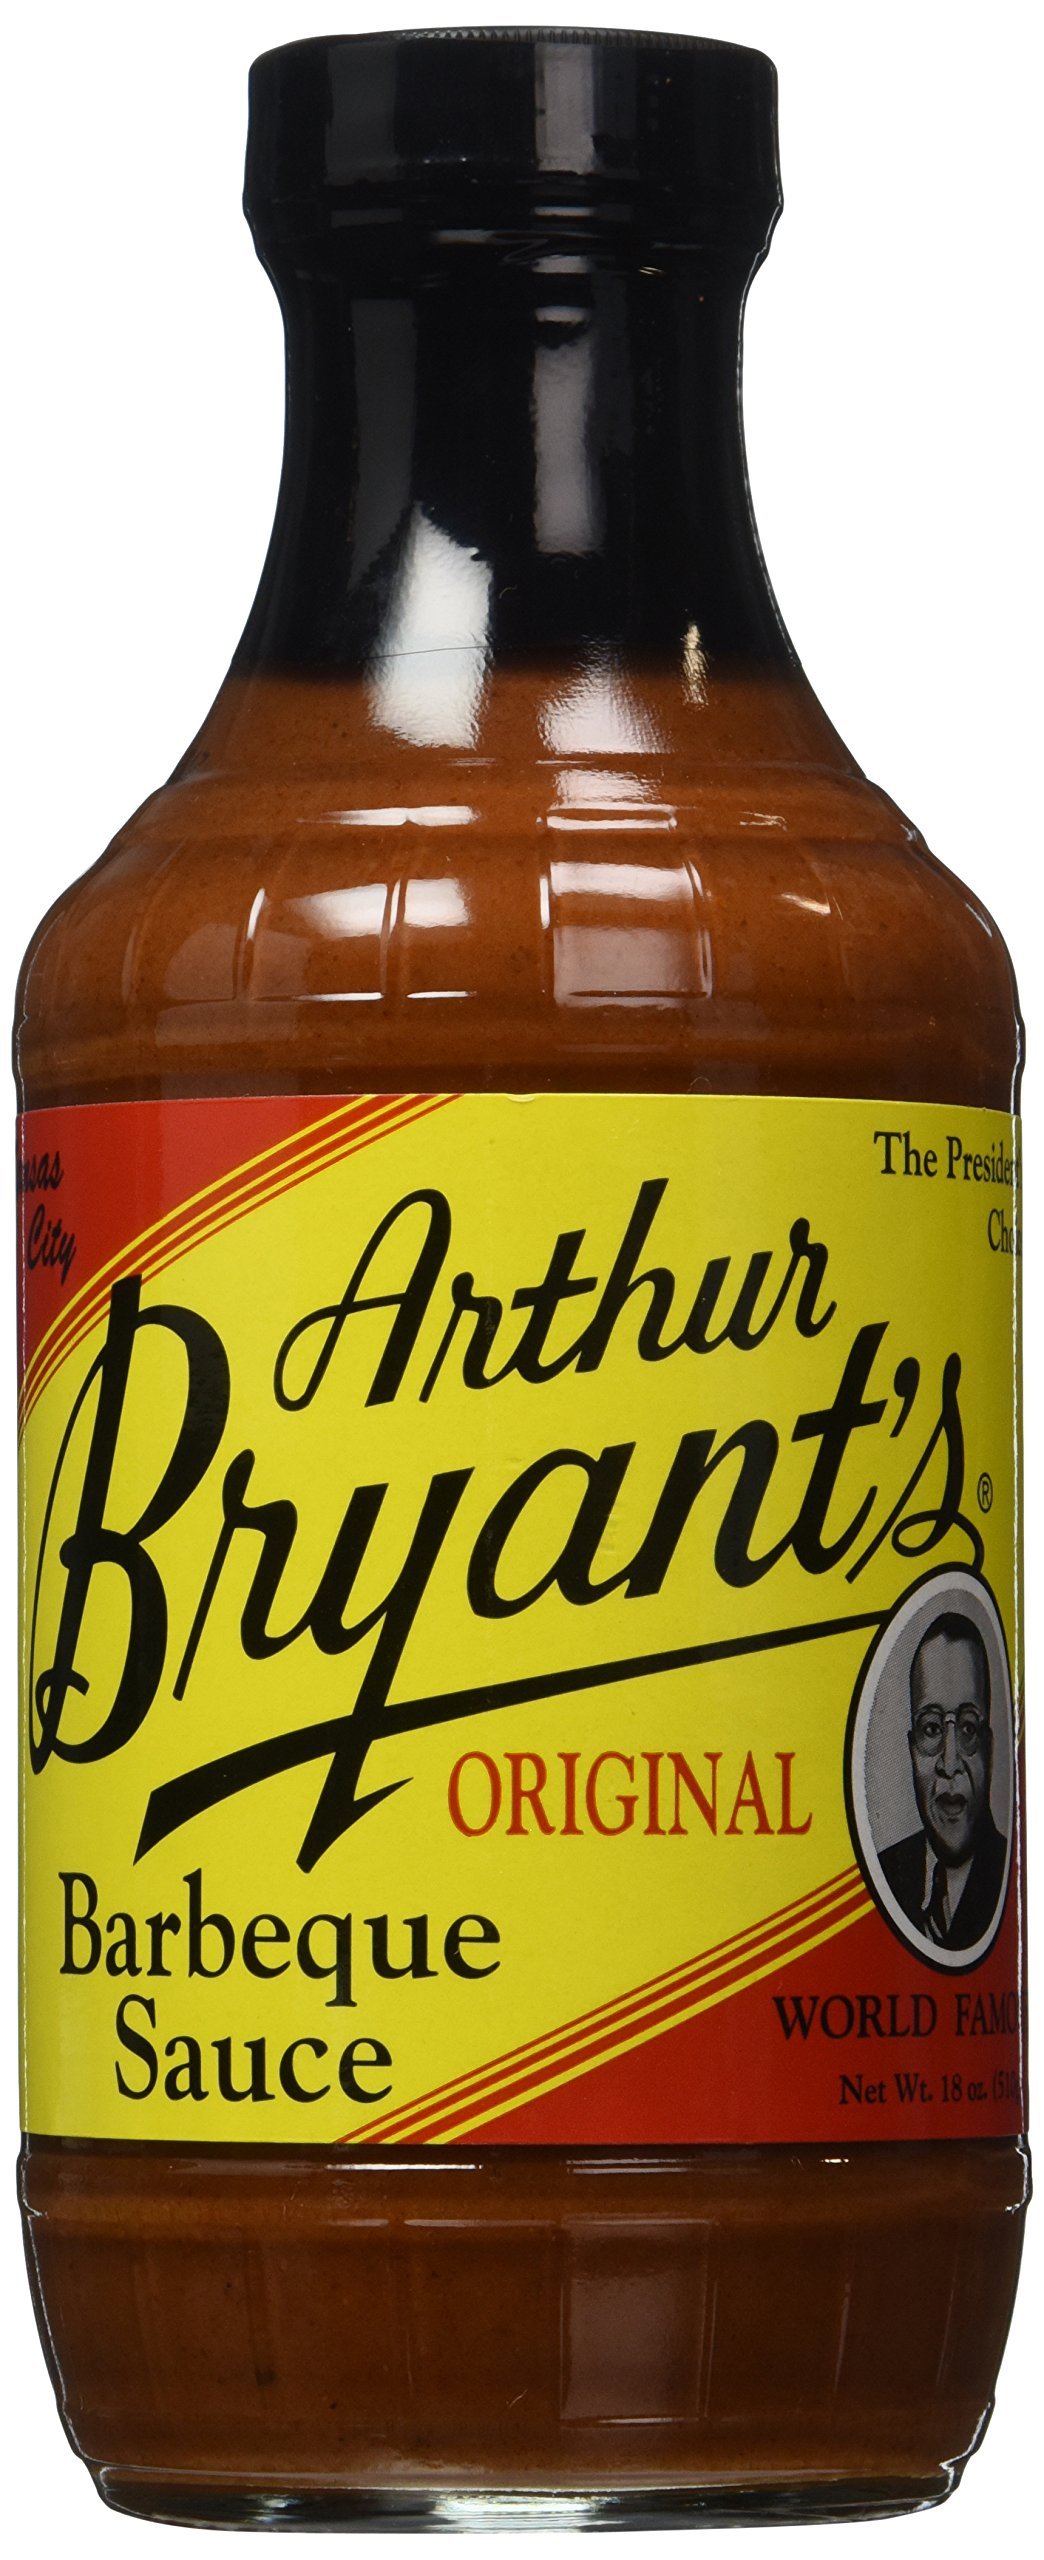 Arthur Bryants Original BBQ Sauce (18 Ounce)